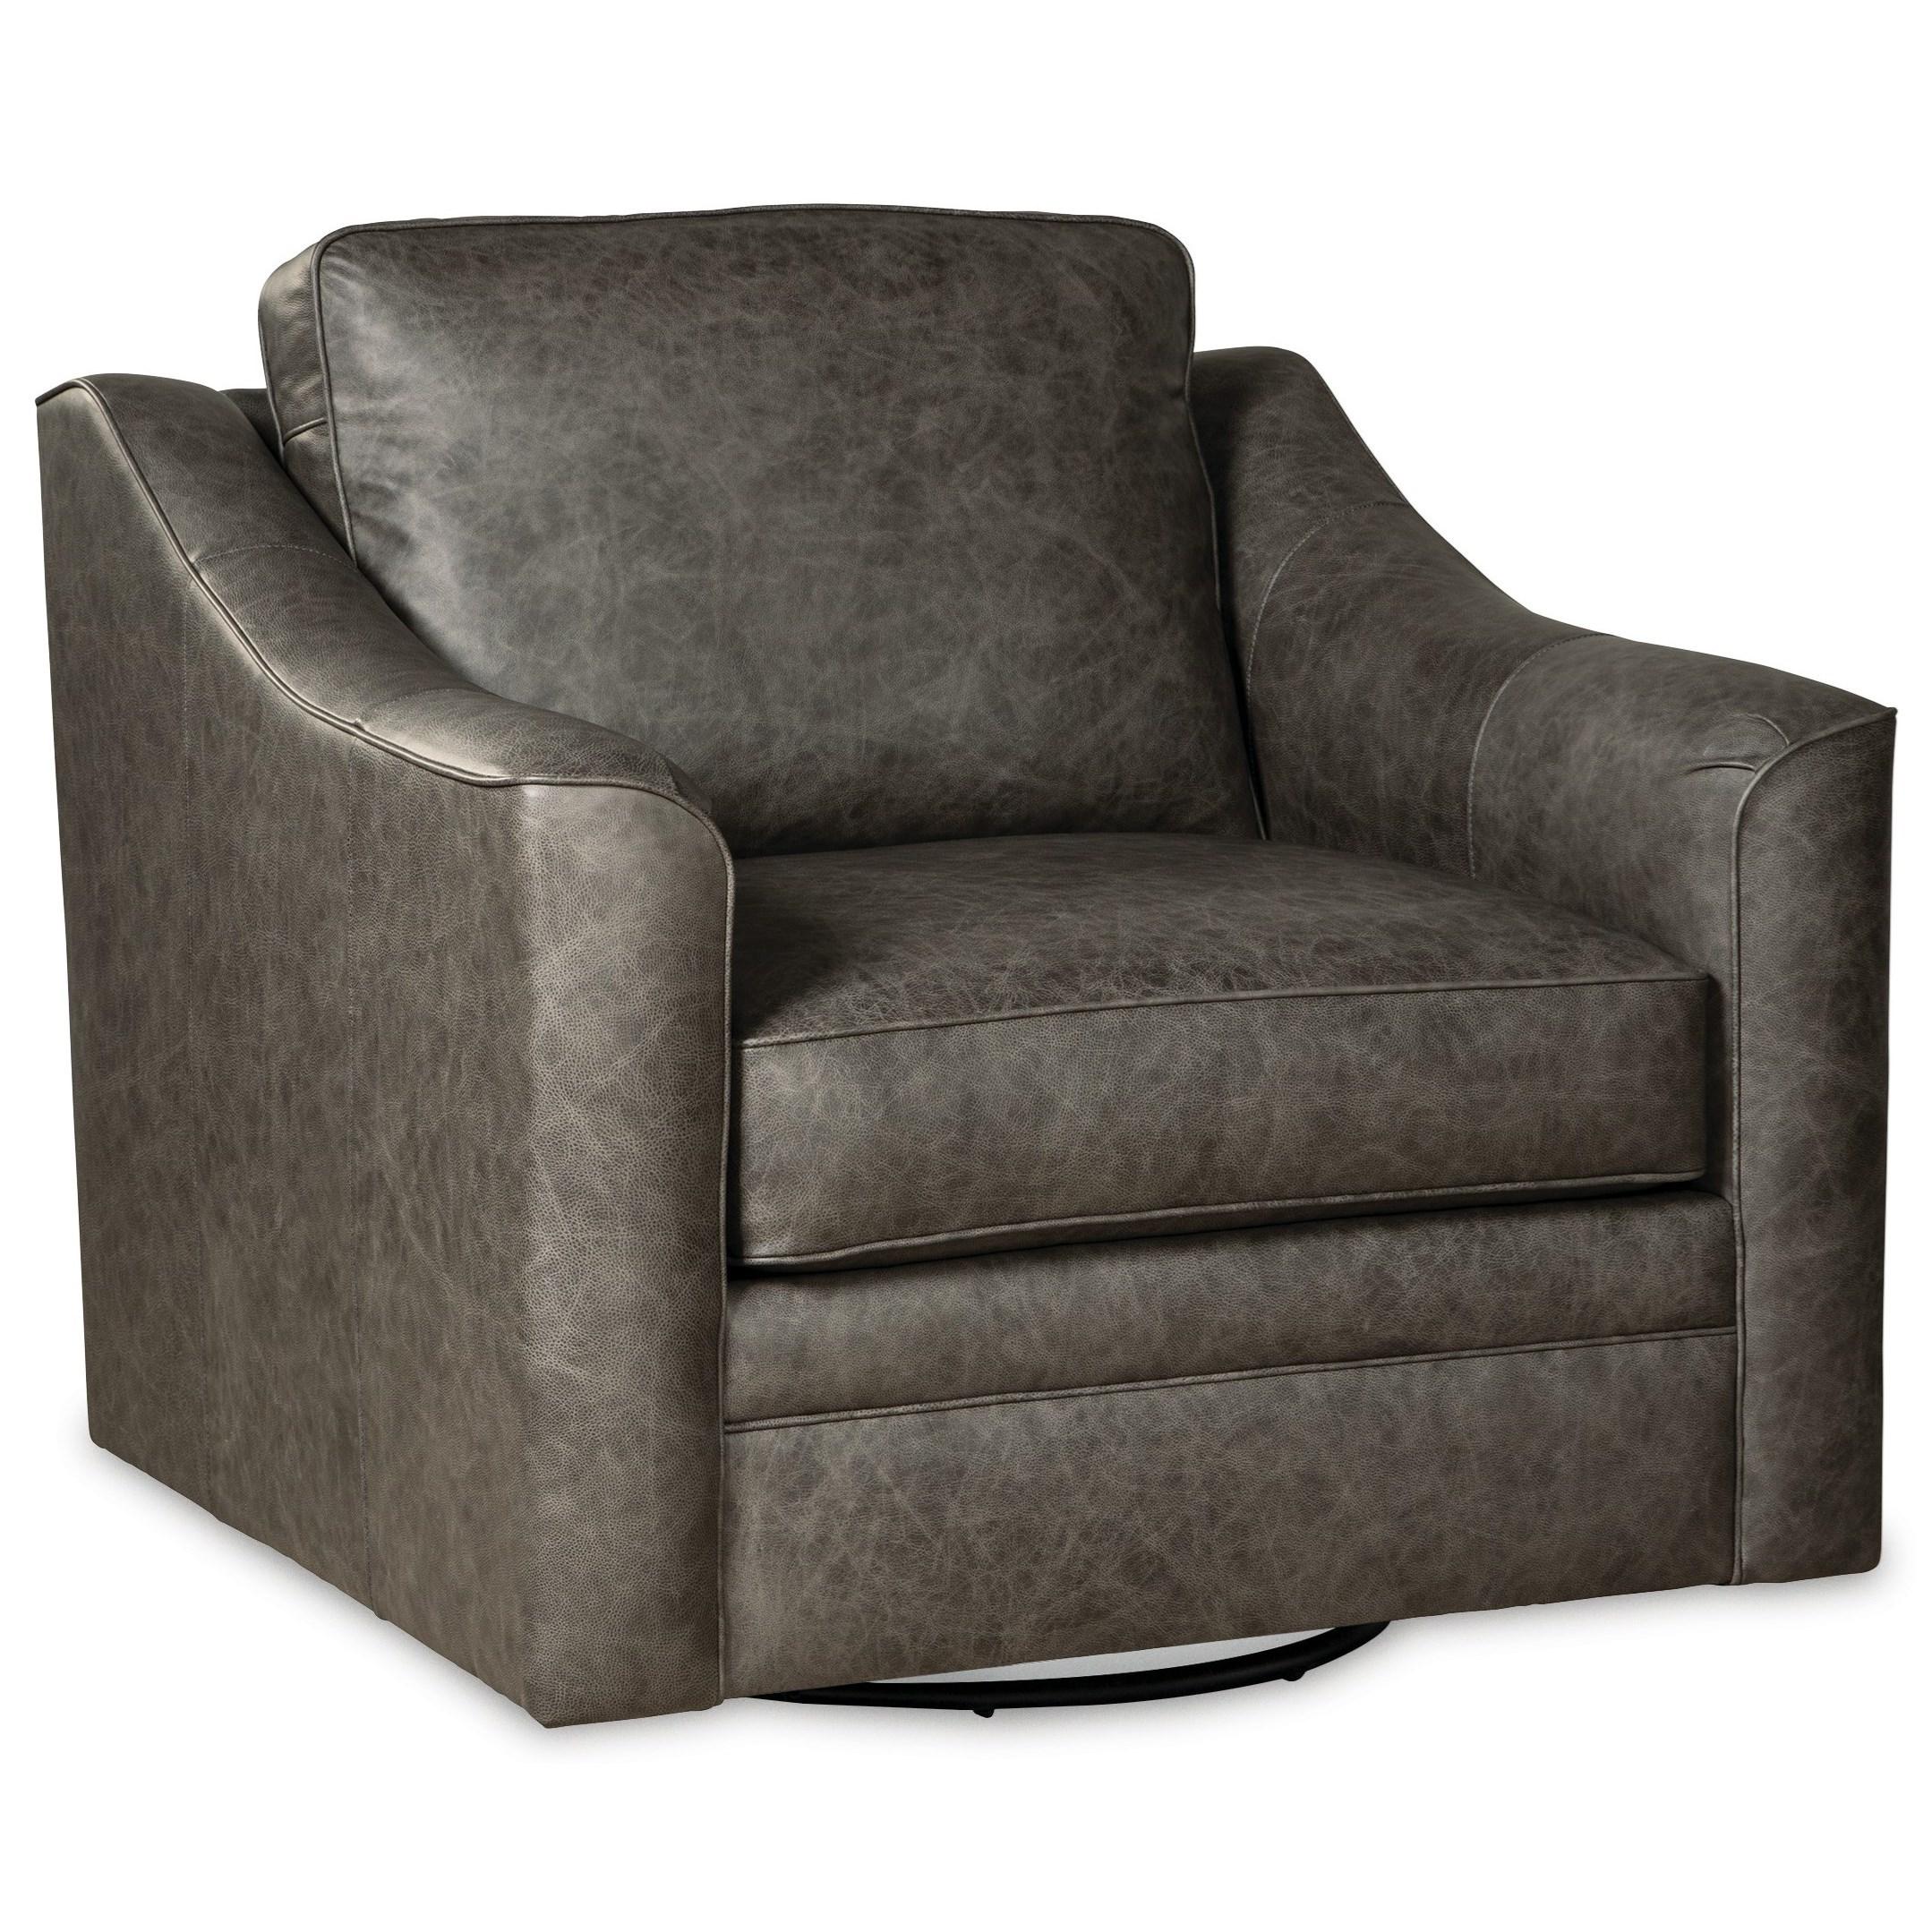 L9 Custom - Design Options Custom Swivel Chair by Craftmaster at Baer's Furniture